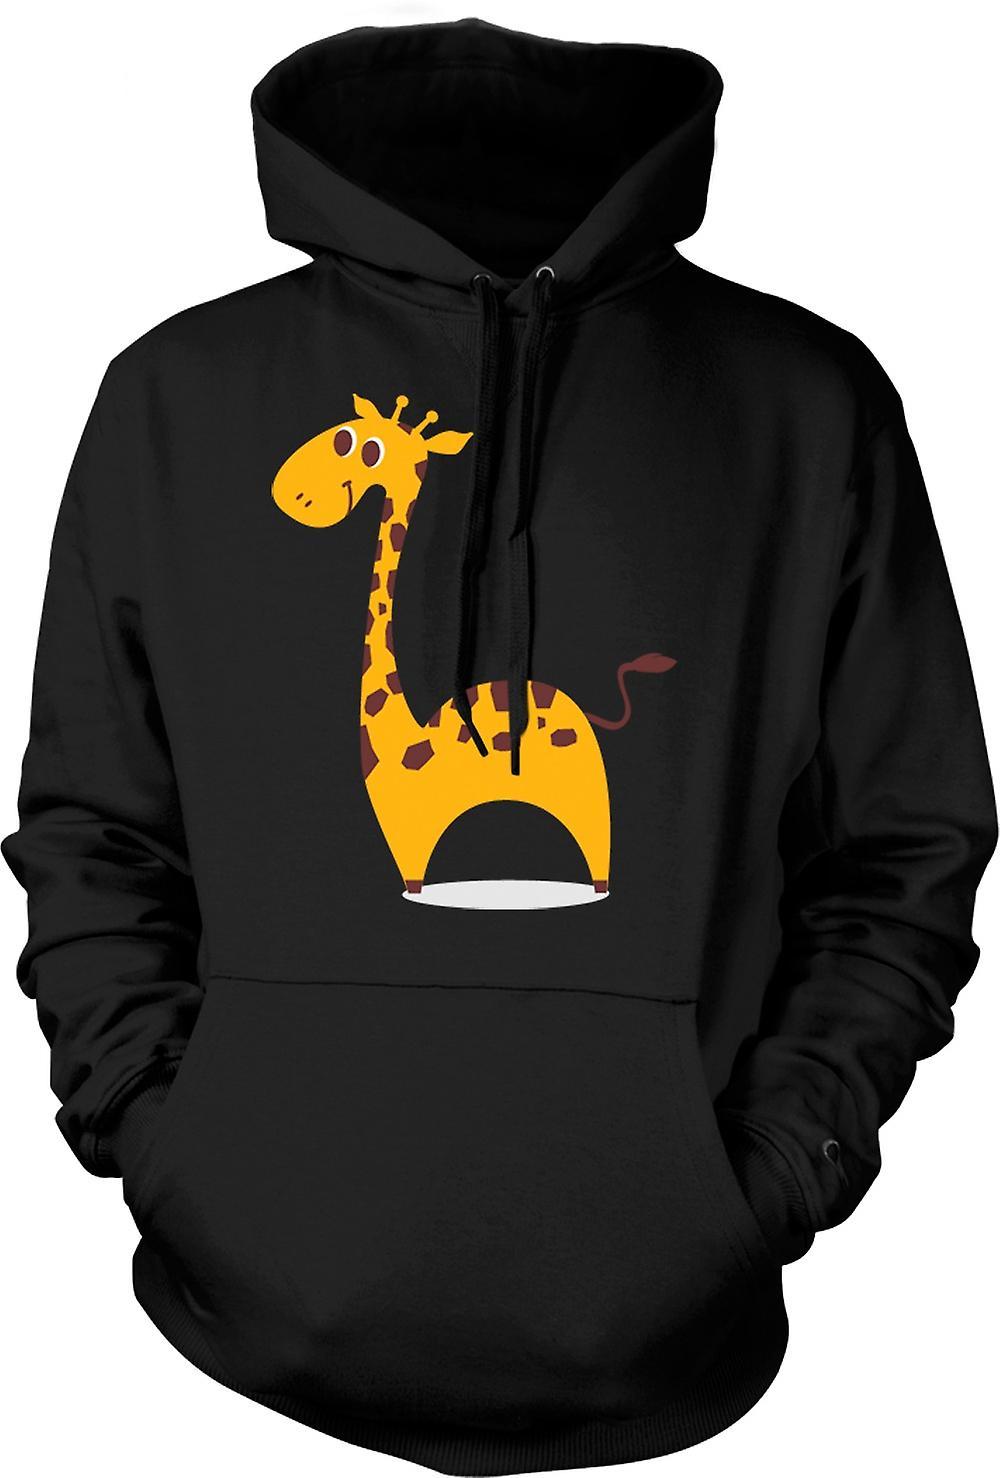 Mens Hoodie - j'adore les girafes - mignon Animal